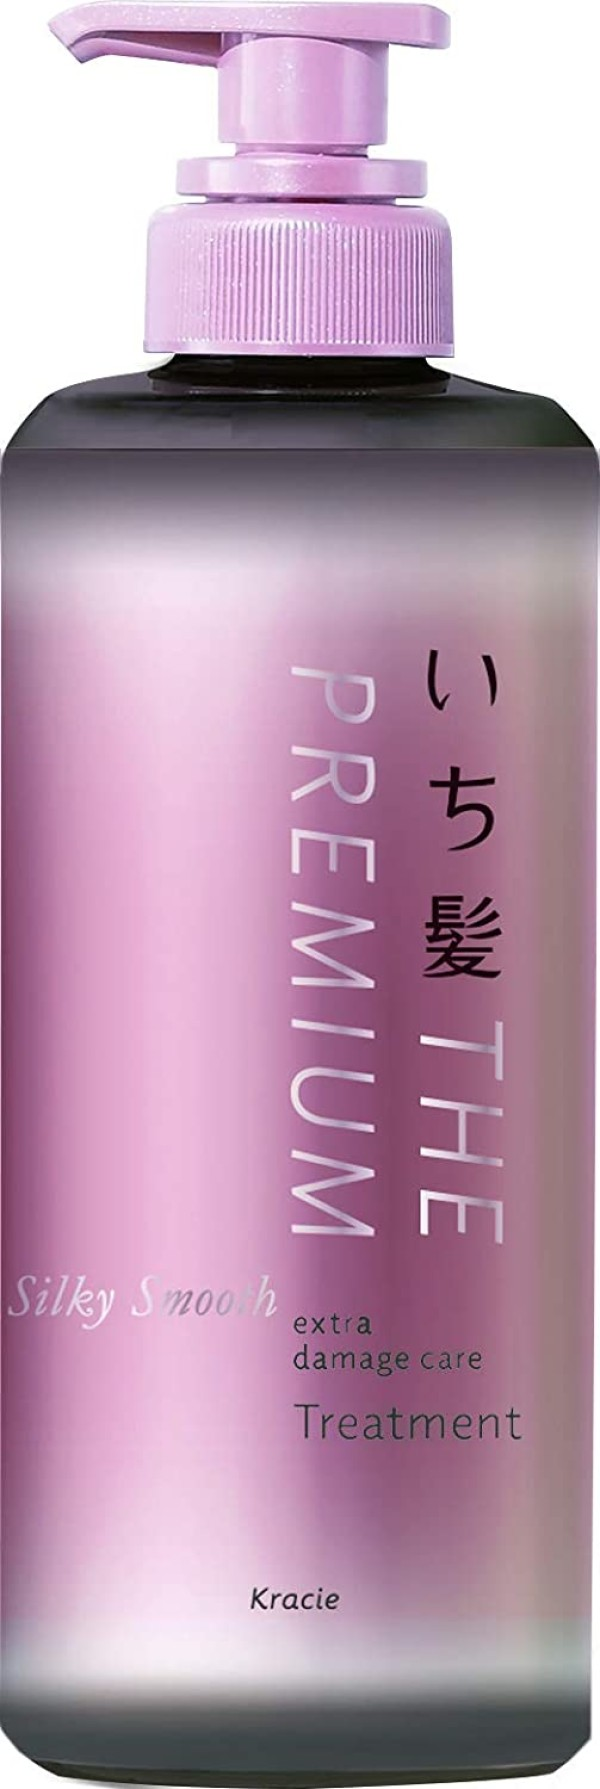 Восстанавливающий кондиционер для гладких, шелковистых волос Kracie Ichikami THE PREMIUM Silky Smooth Extra Damage Care Treatment